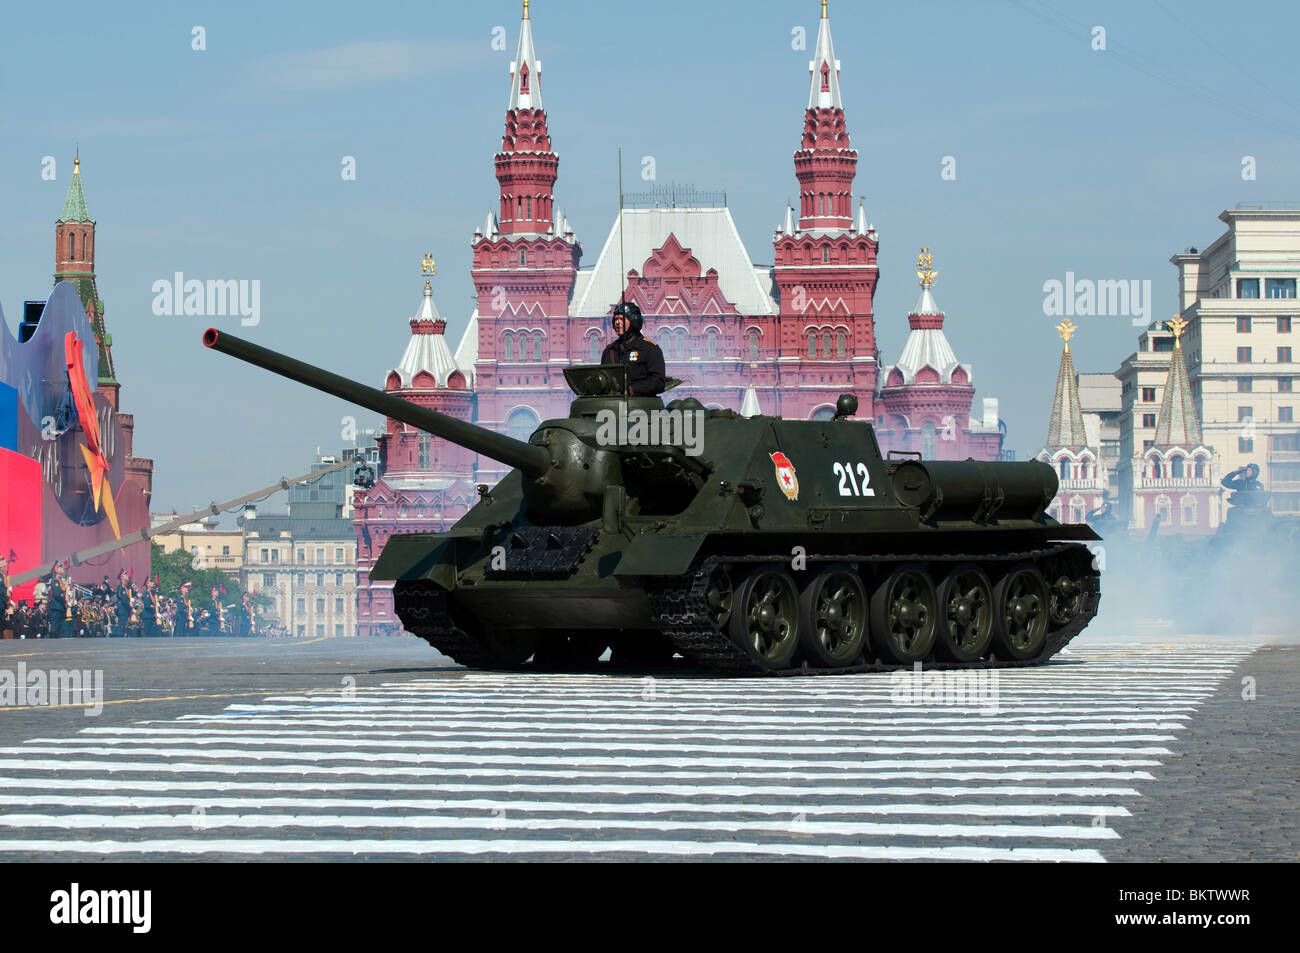 http://c8.alamy.com/comp/BKTWWR/legendary-soviet-tank-destroyer-su-100-from-the-second-world-war-march-BKTWWR.jpg